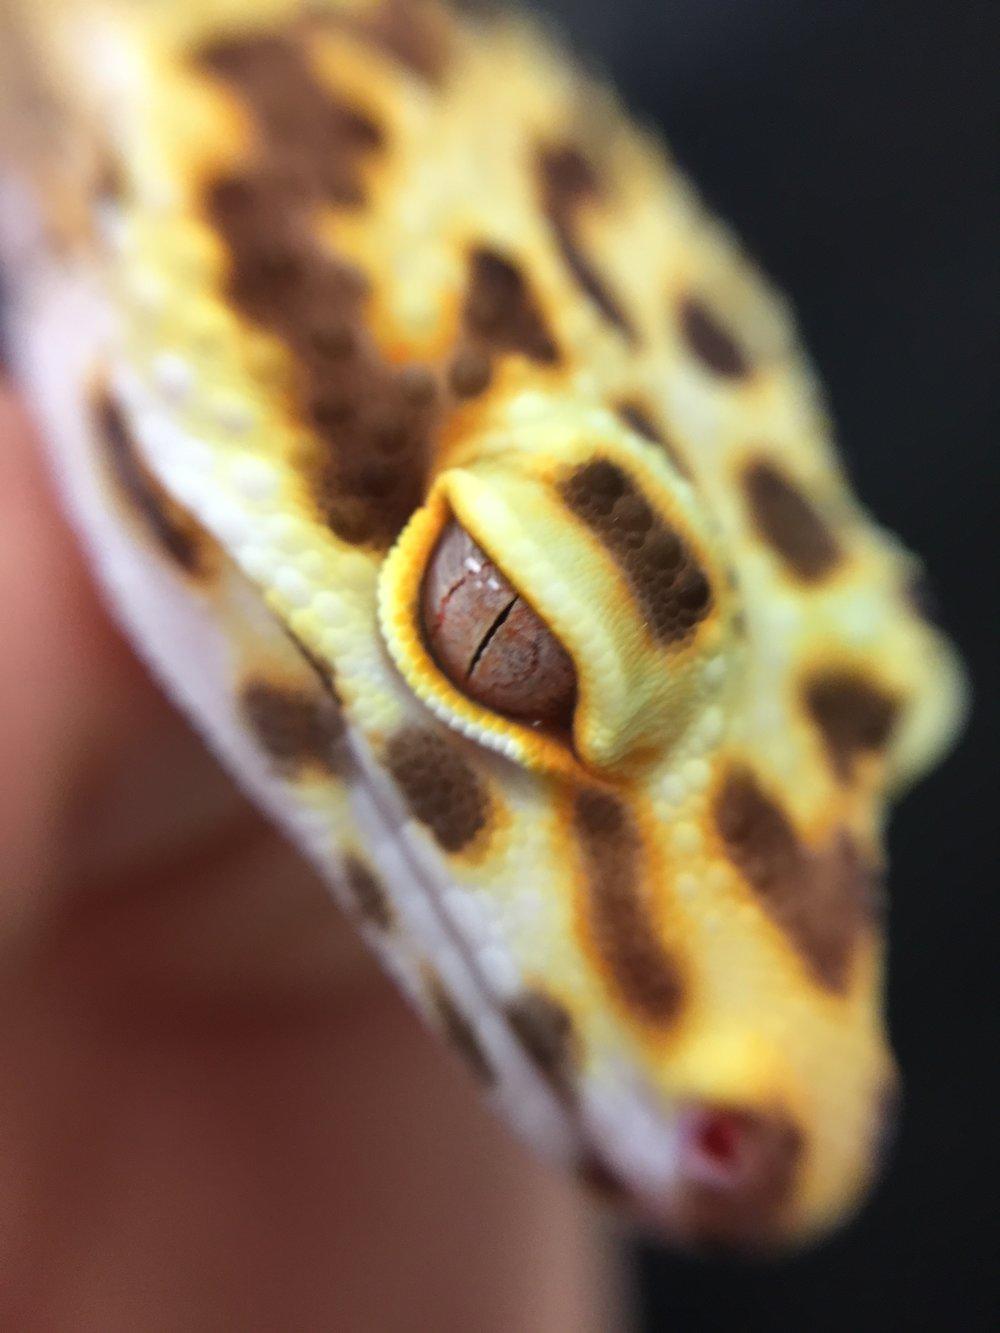 The eye of a tremper albino.